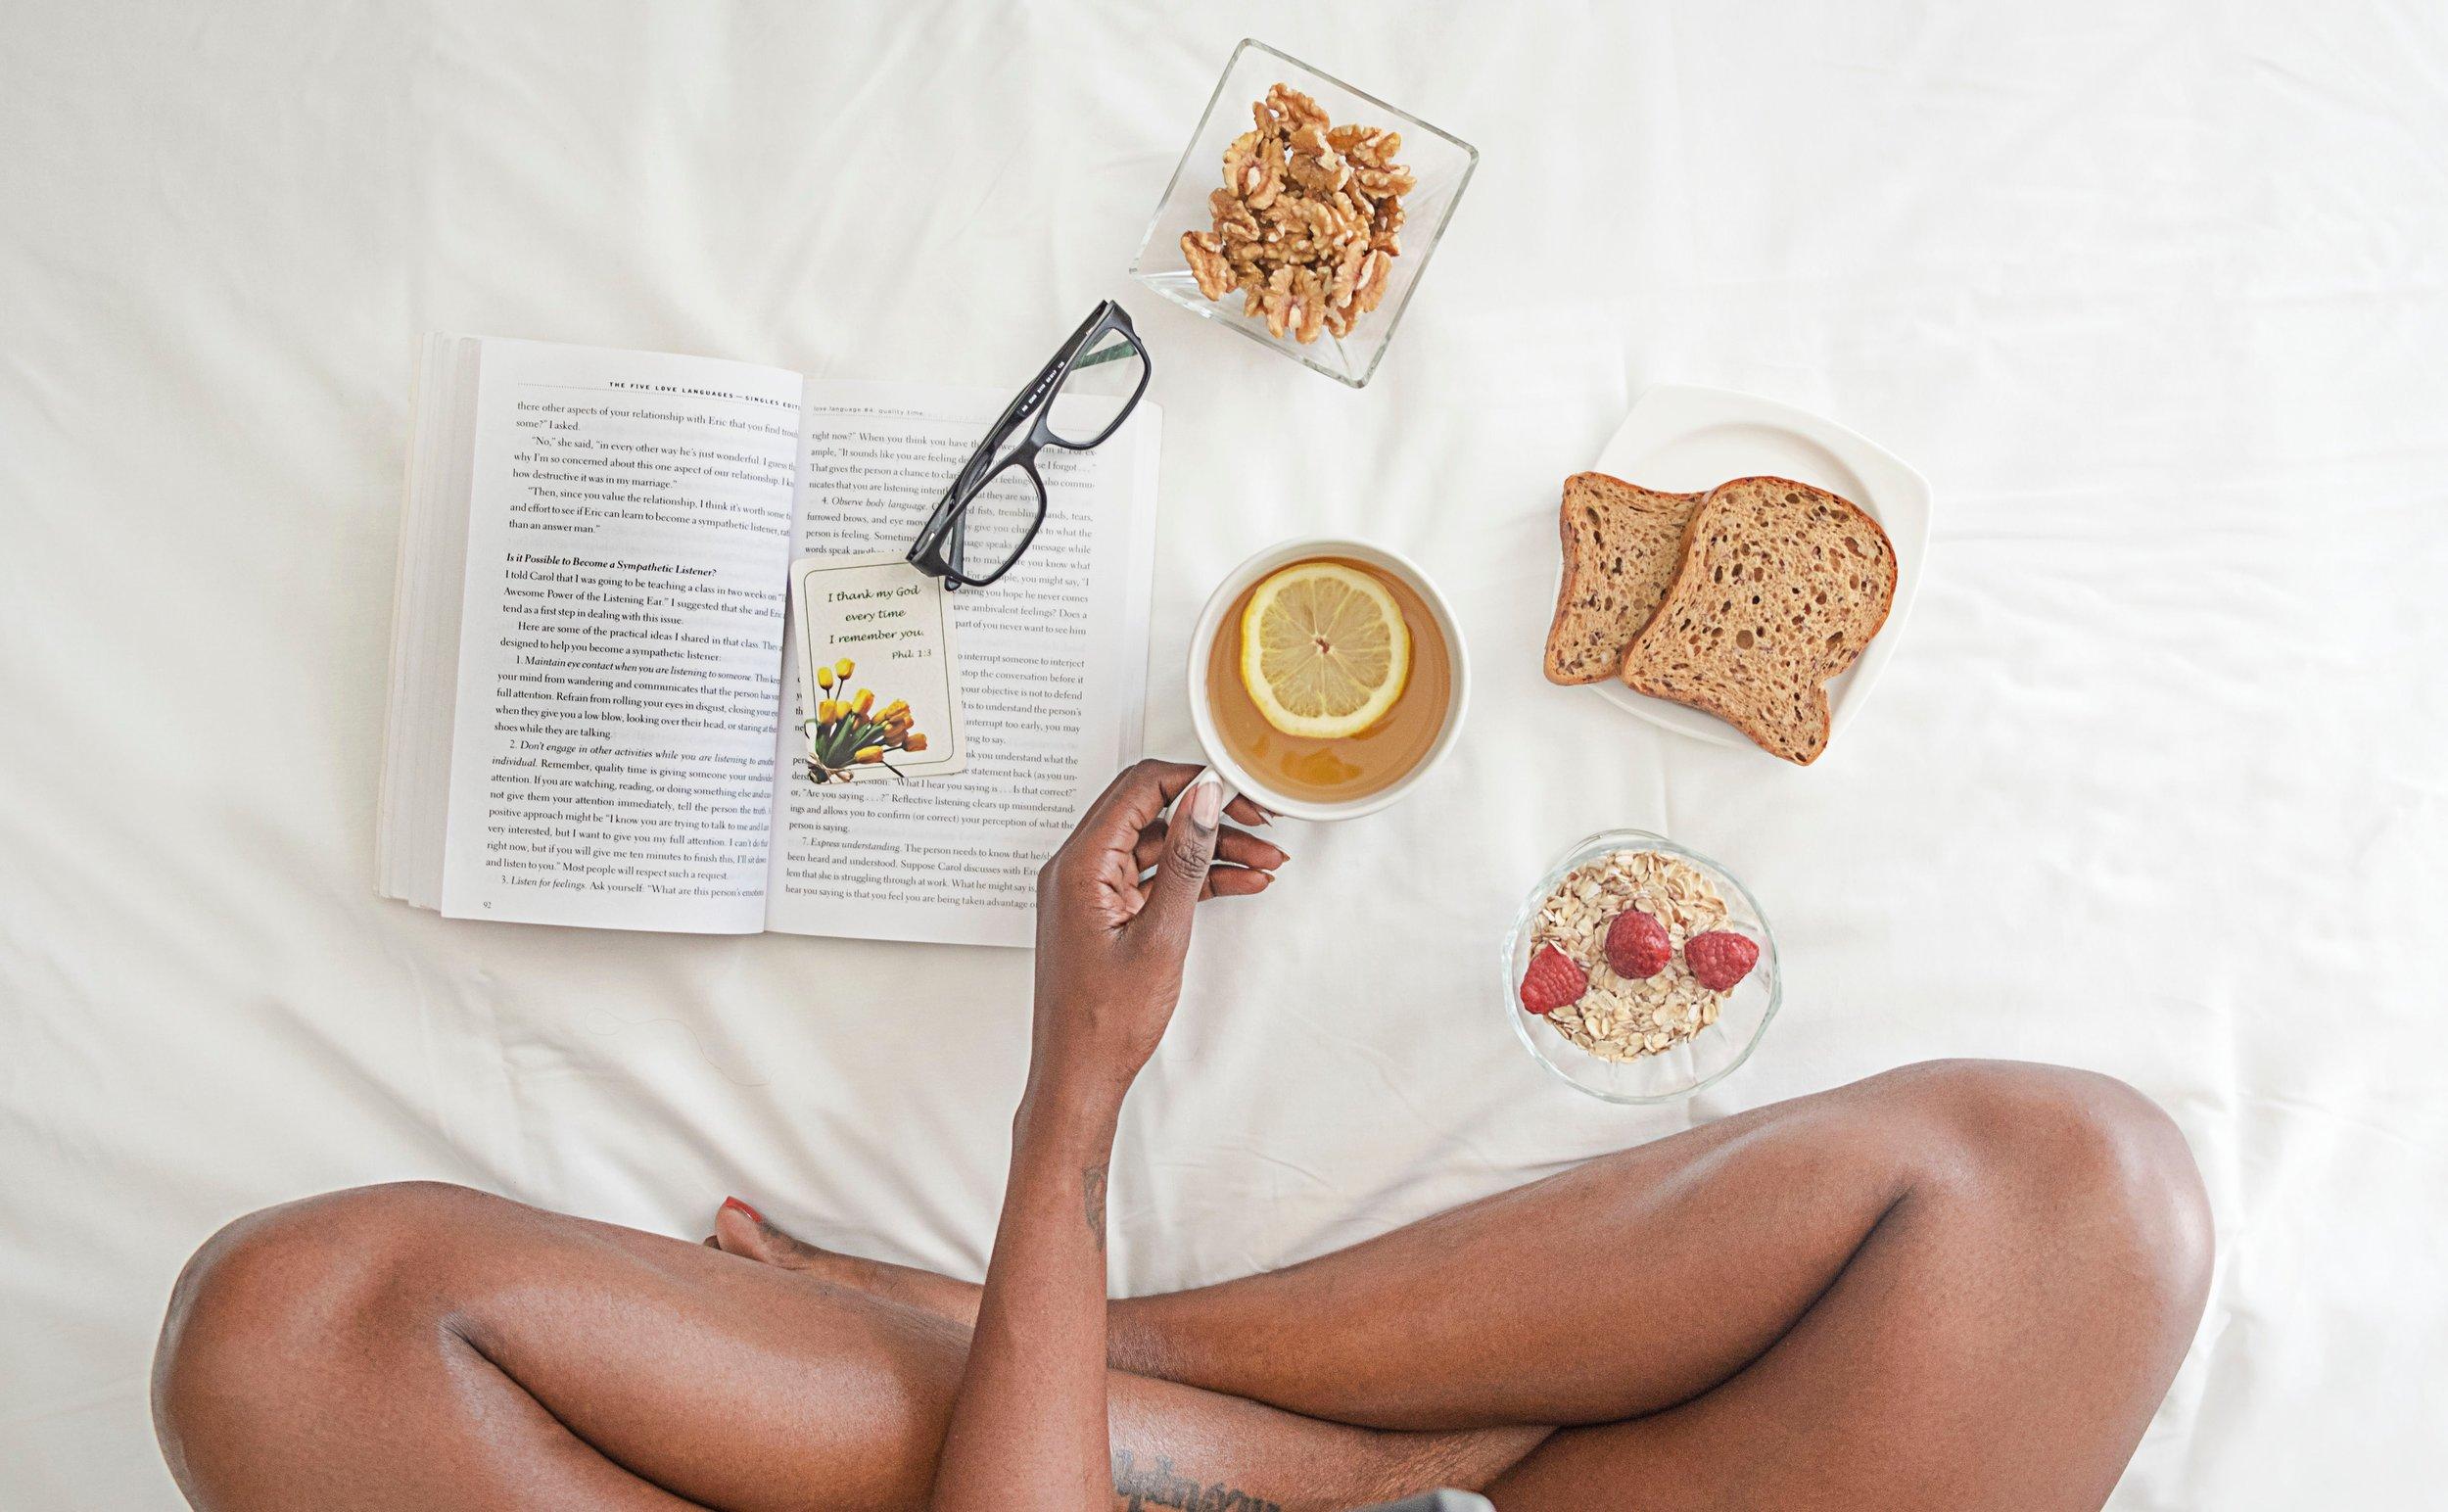 uwm.wsp.newyearbetteryou.bed-book-breads-1065588.jpg